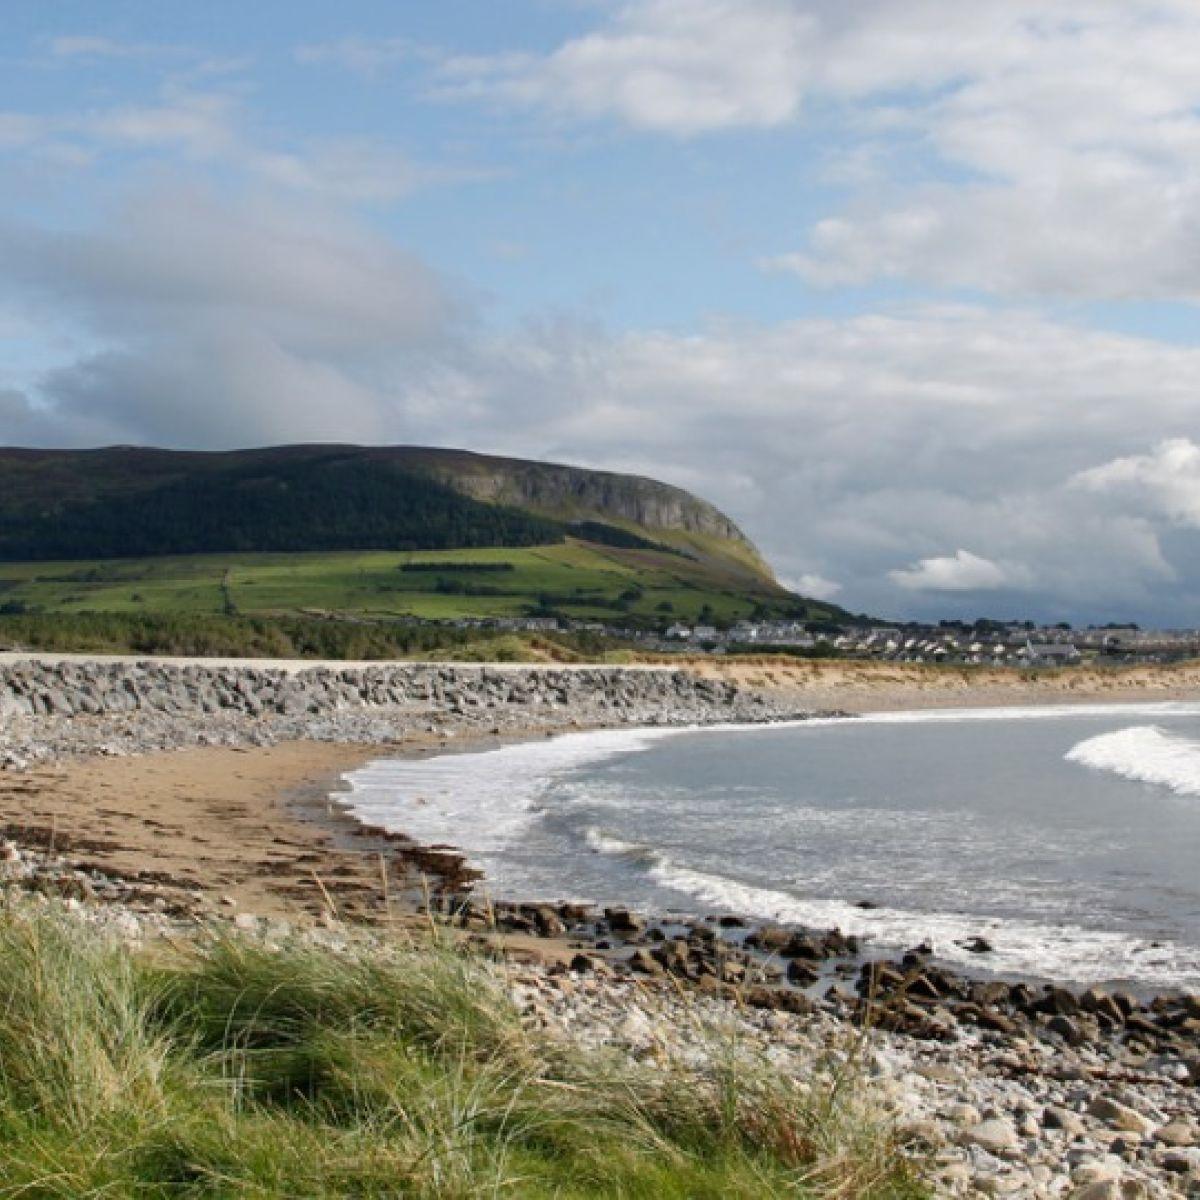 10 Top-Rated Tourist Attractions in Sligo | PlanetWare